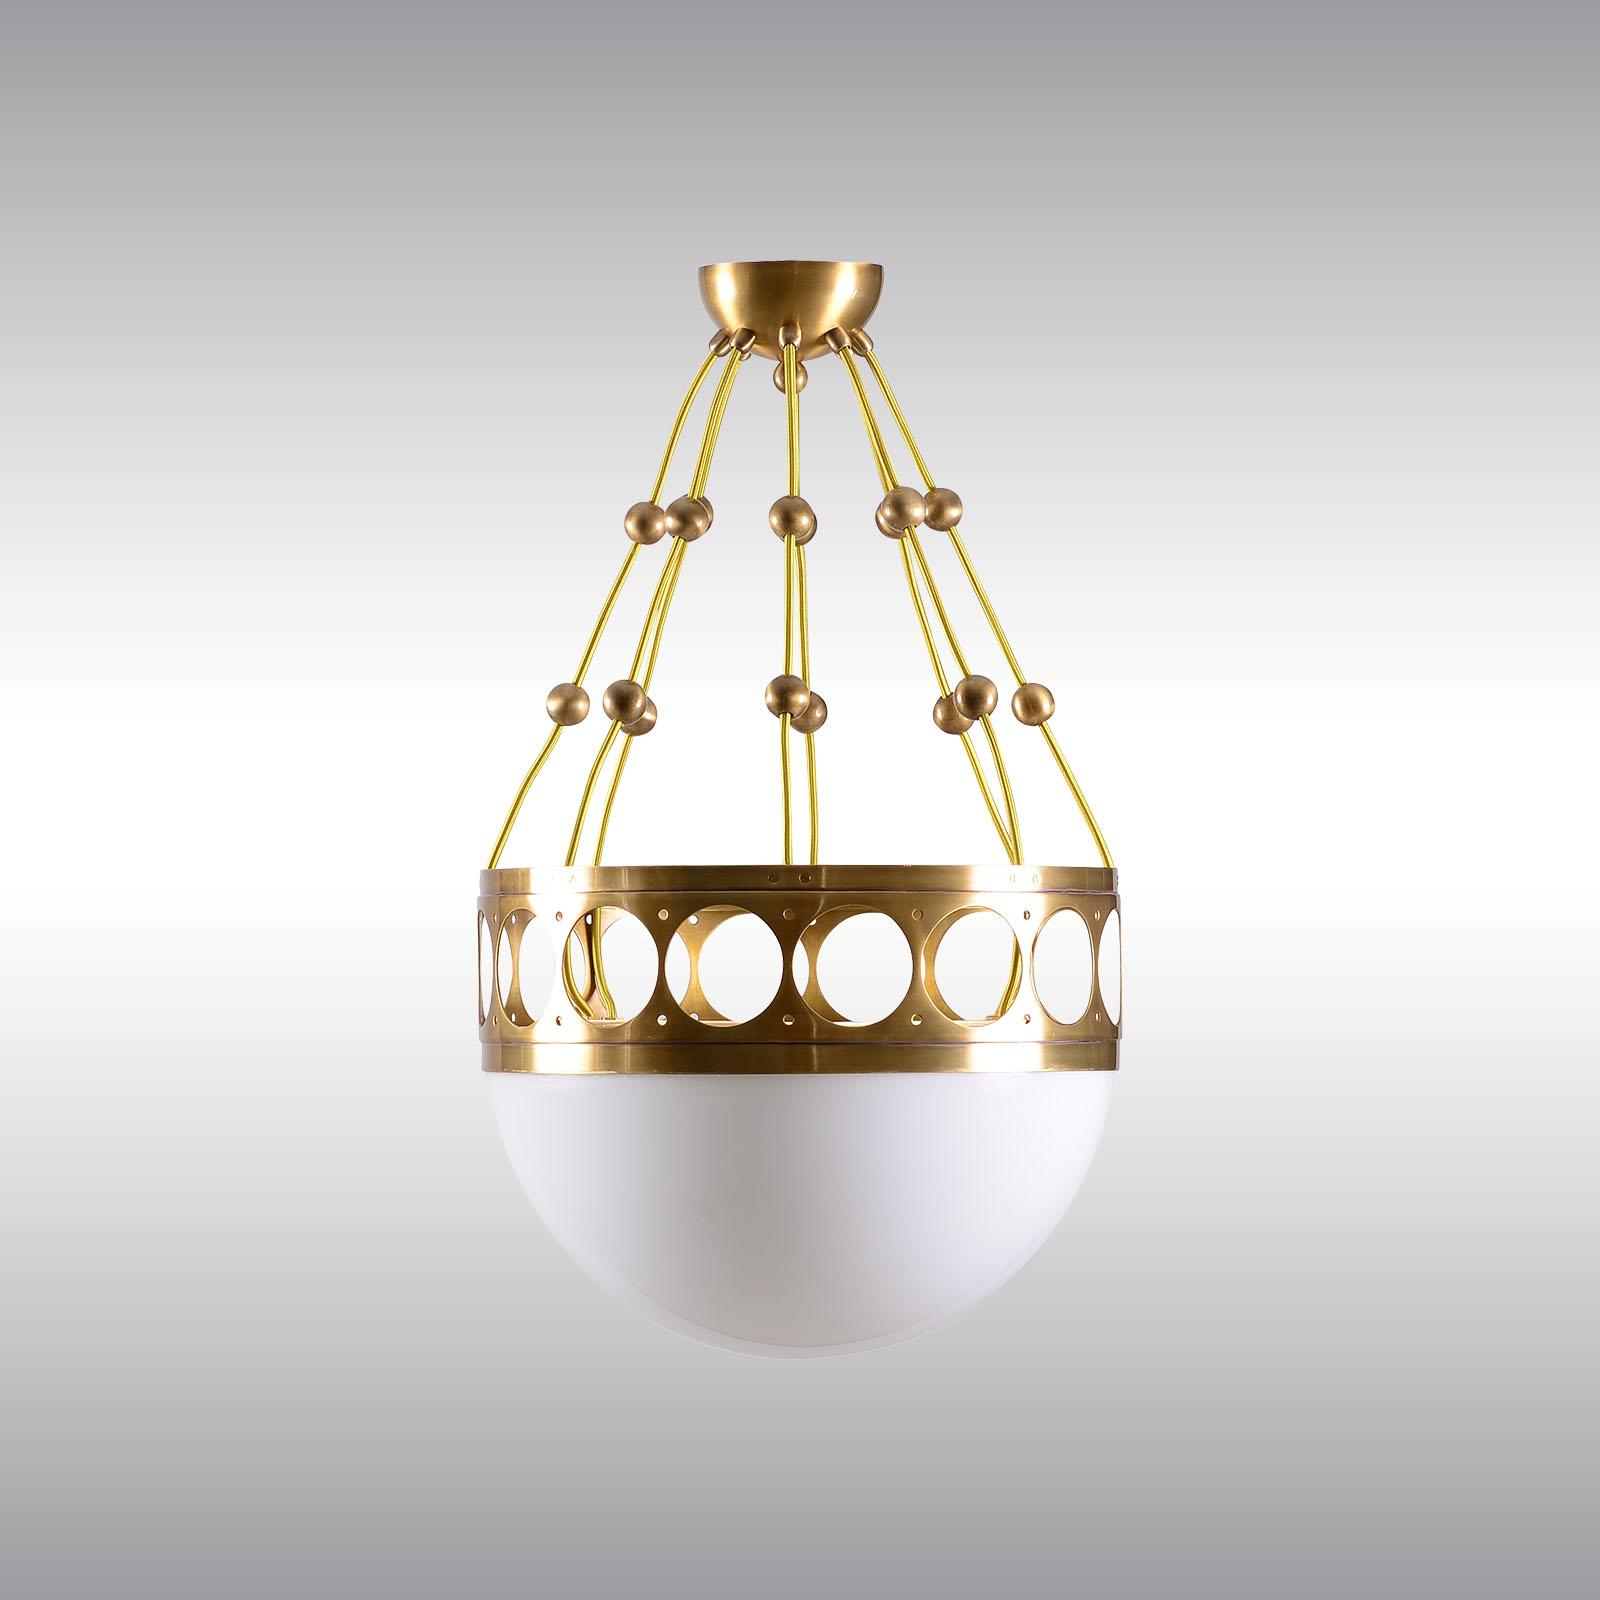 ICFF 2019 Amazing Woka Lamps and Furniture Designs - Zacherl-35 icff ICFF 2019: Amazing Woka Lamps and Furniture Designs ICFF 2019 Amazing Woka Lamps and Furniture Designs Zacherl 35